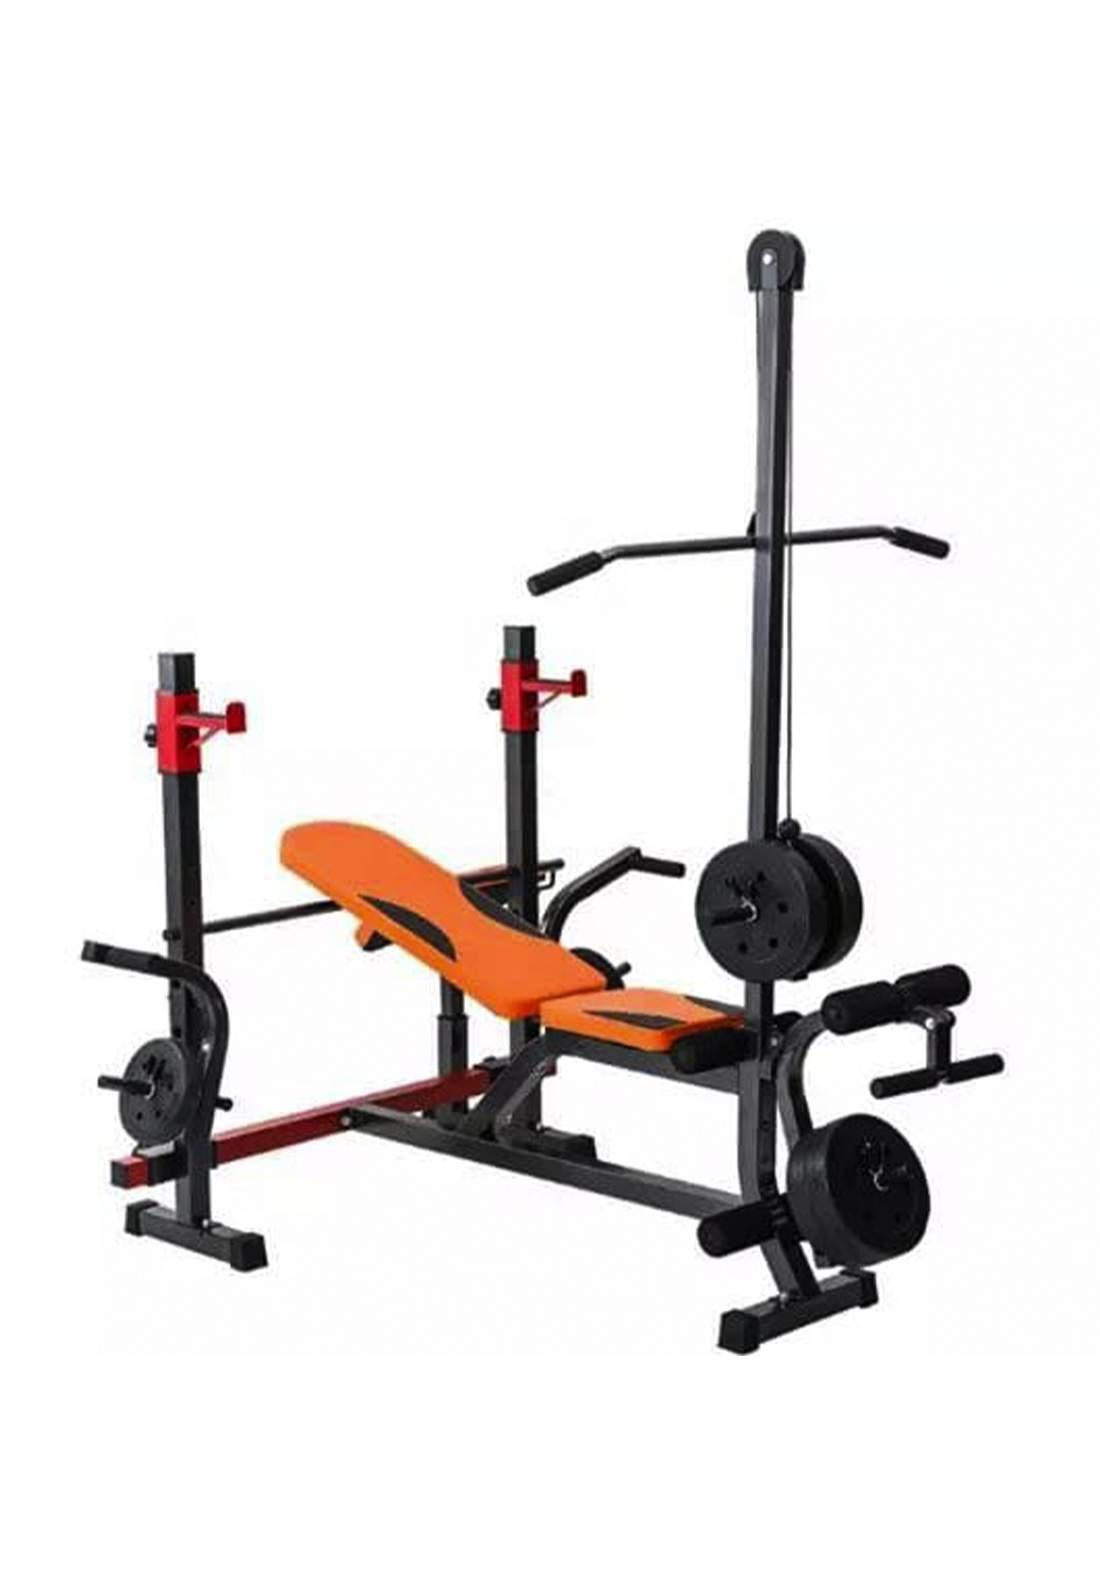 Multifunctional weight training bench مقعد التمارين الرياضية